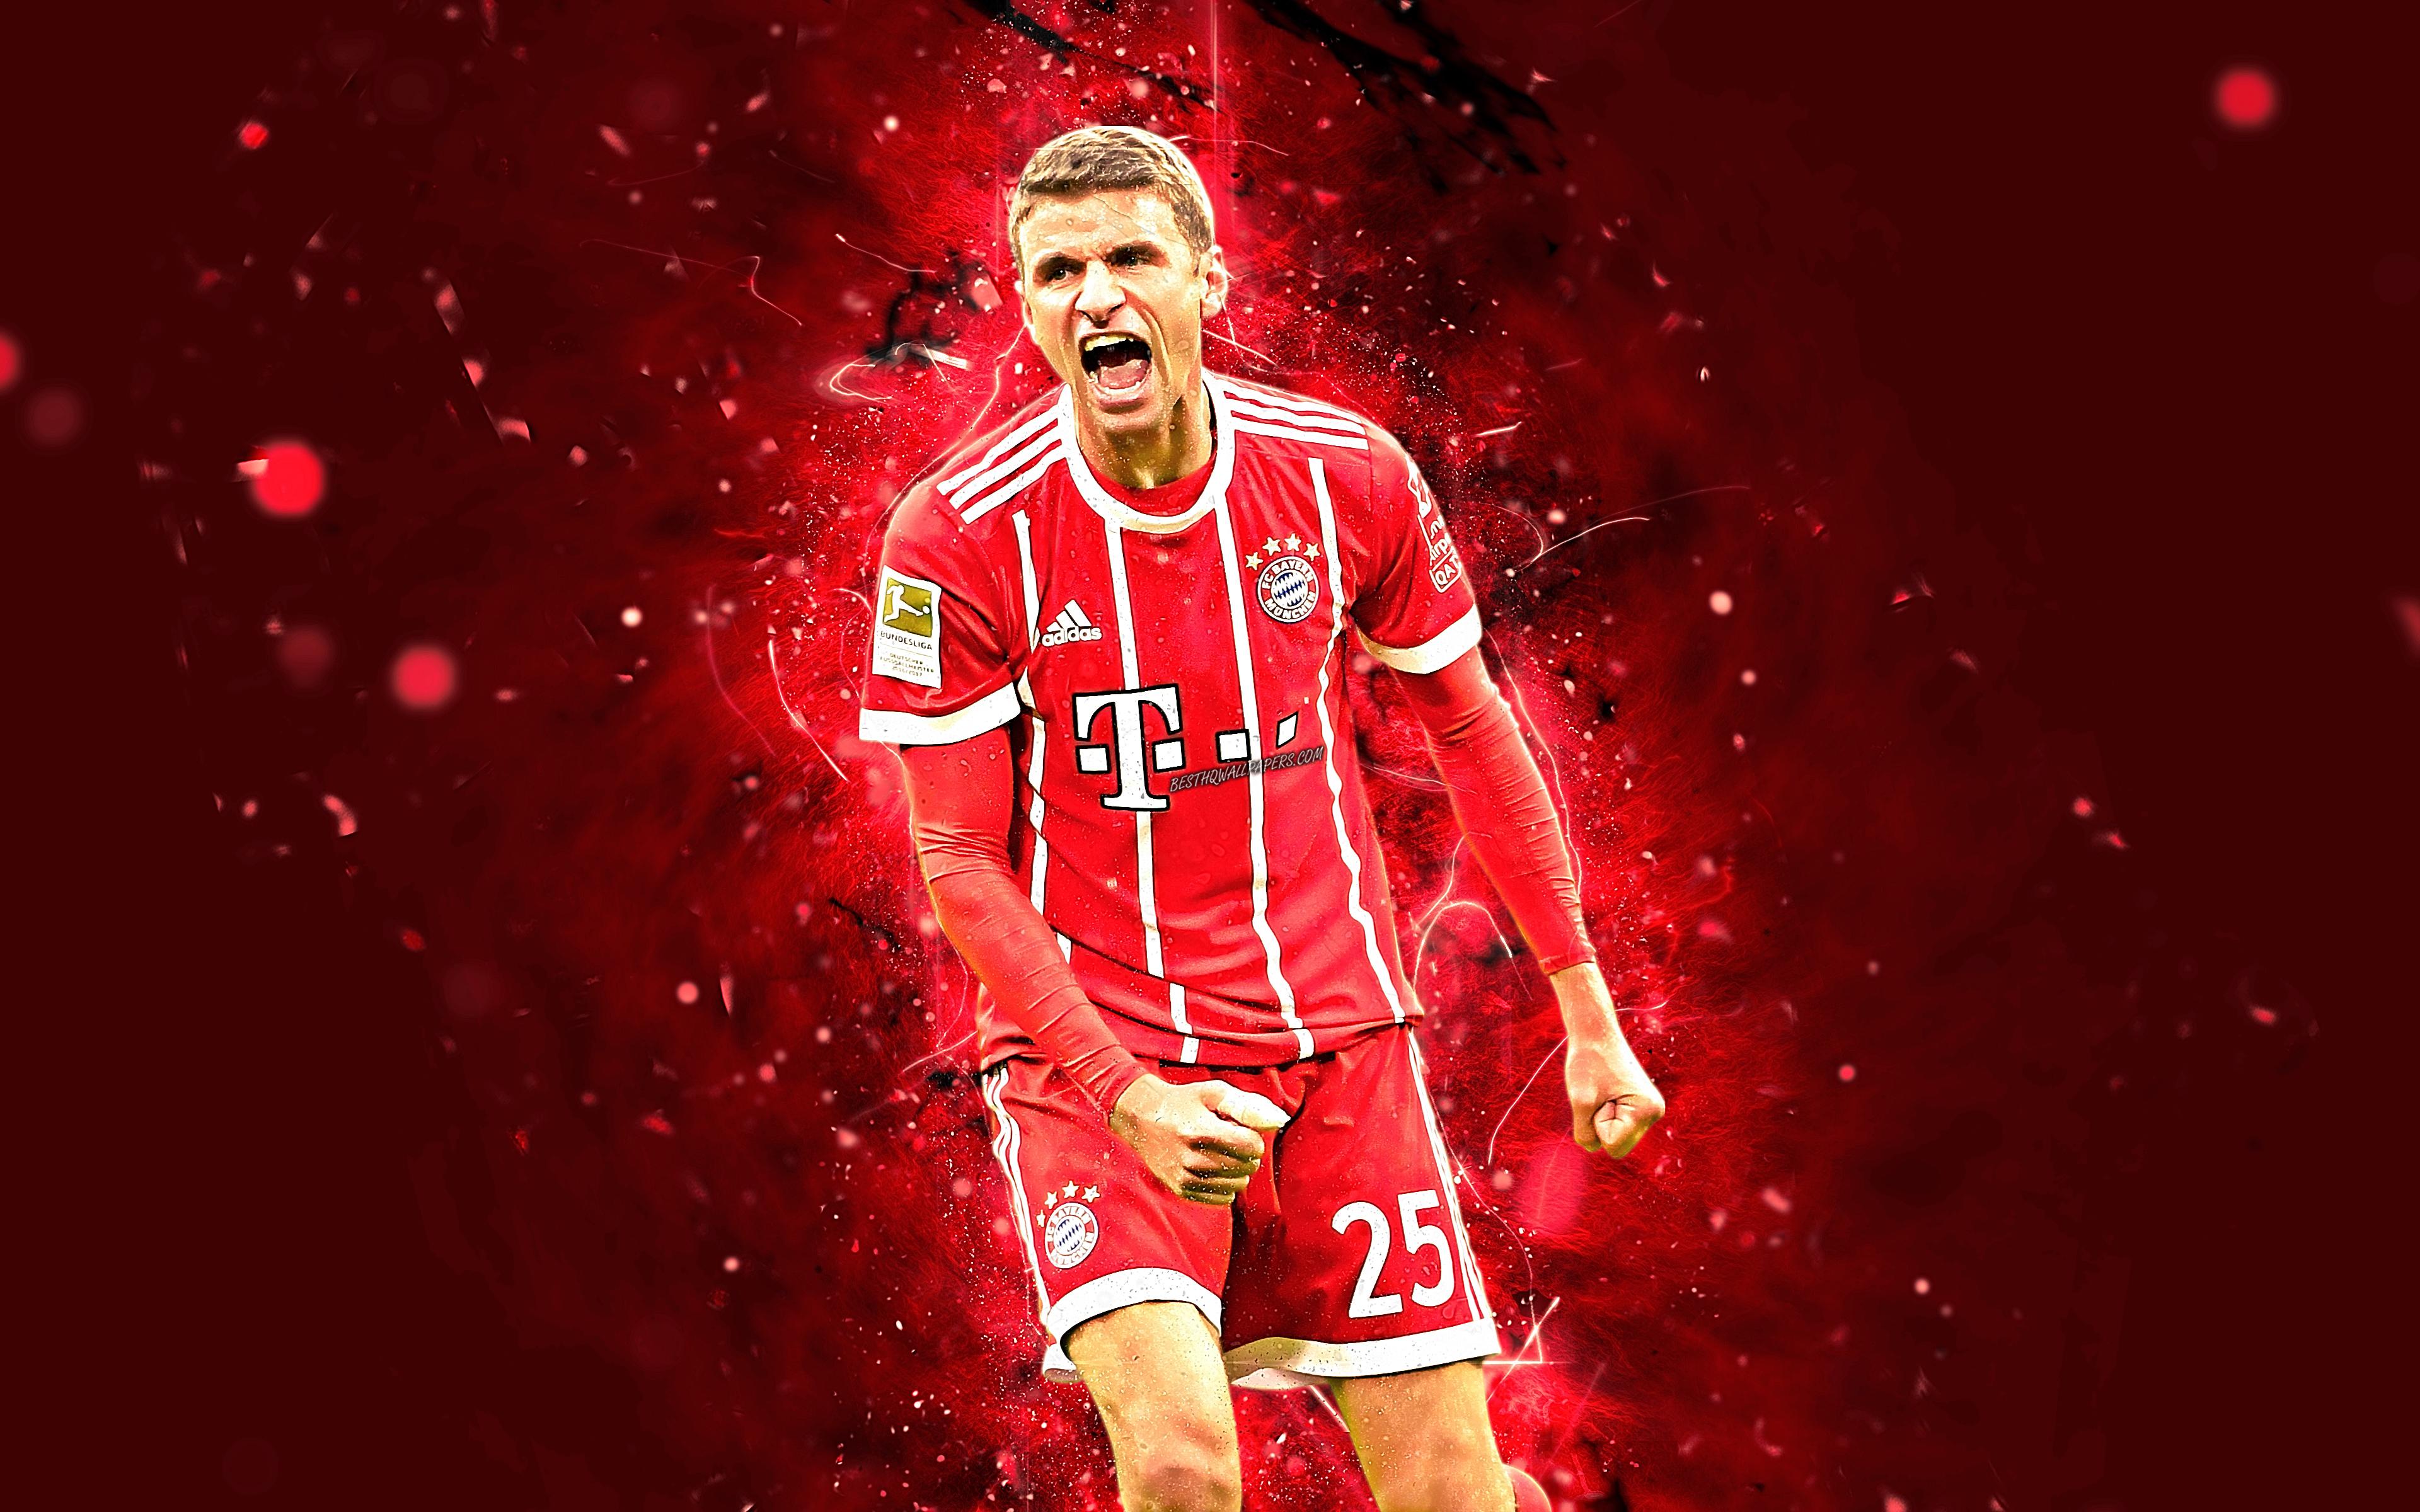 4k Thomas Muller Abstract Art Football Stars Bayern Joao Felix Wallpaper 4k 1519978 Hd Wallpaper Backgrounds Download